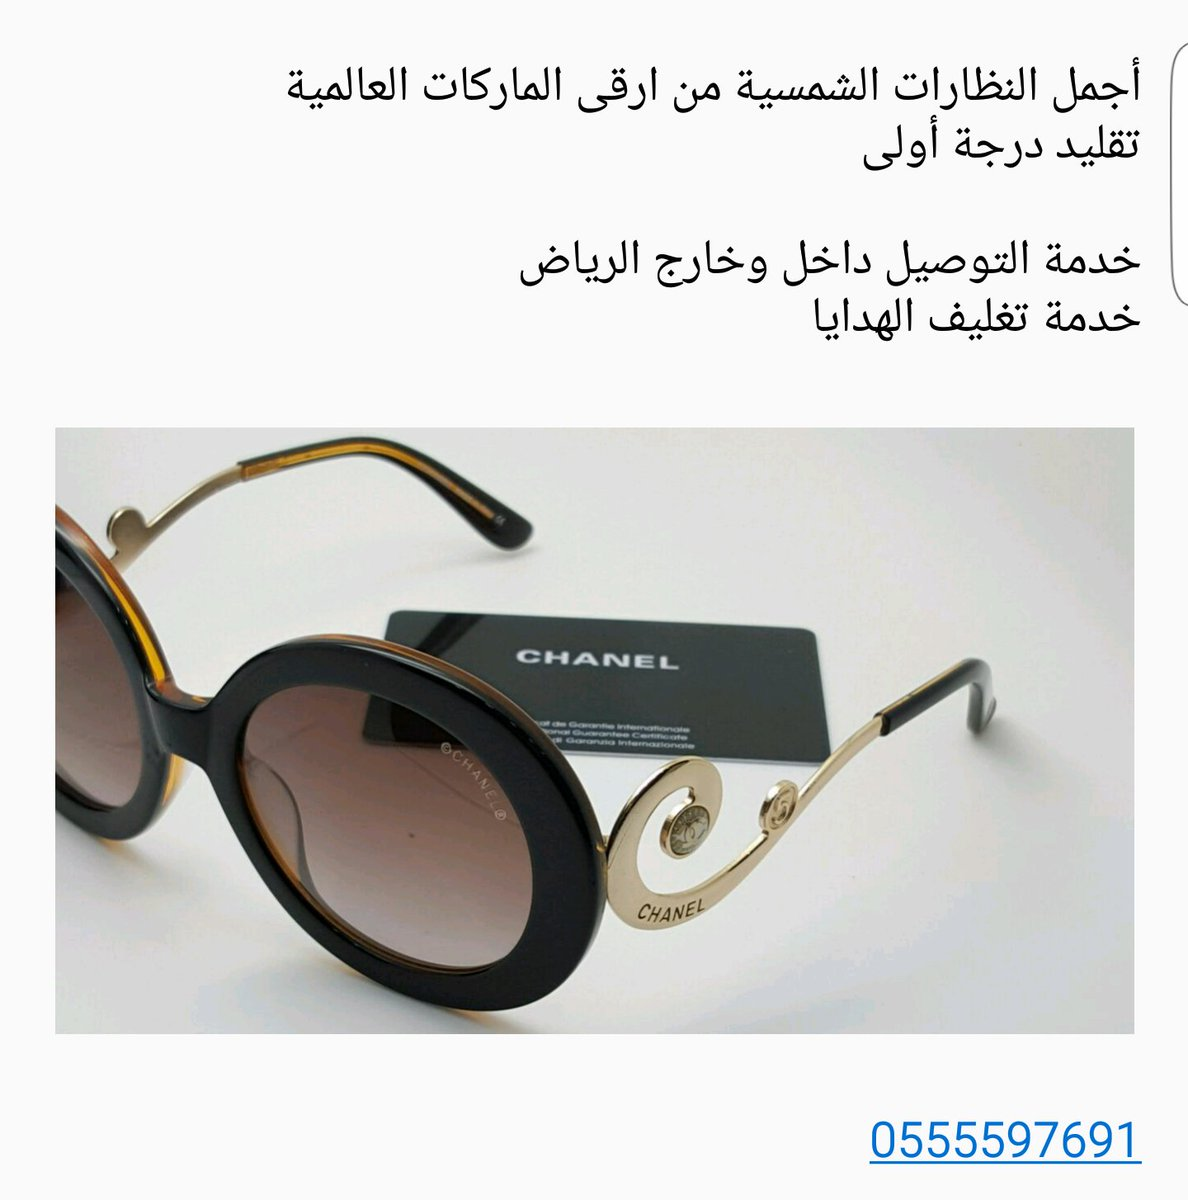 e655f741a0bdd  نظارات  شمسية  الرياض  الجنادرية  السعودية   FREE 1900pic.twitter.com JCopK01Yfi